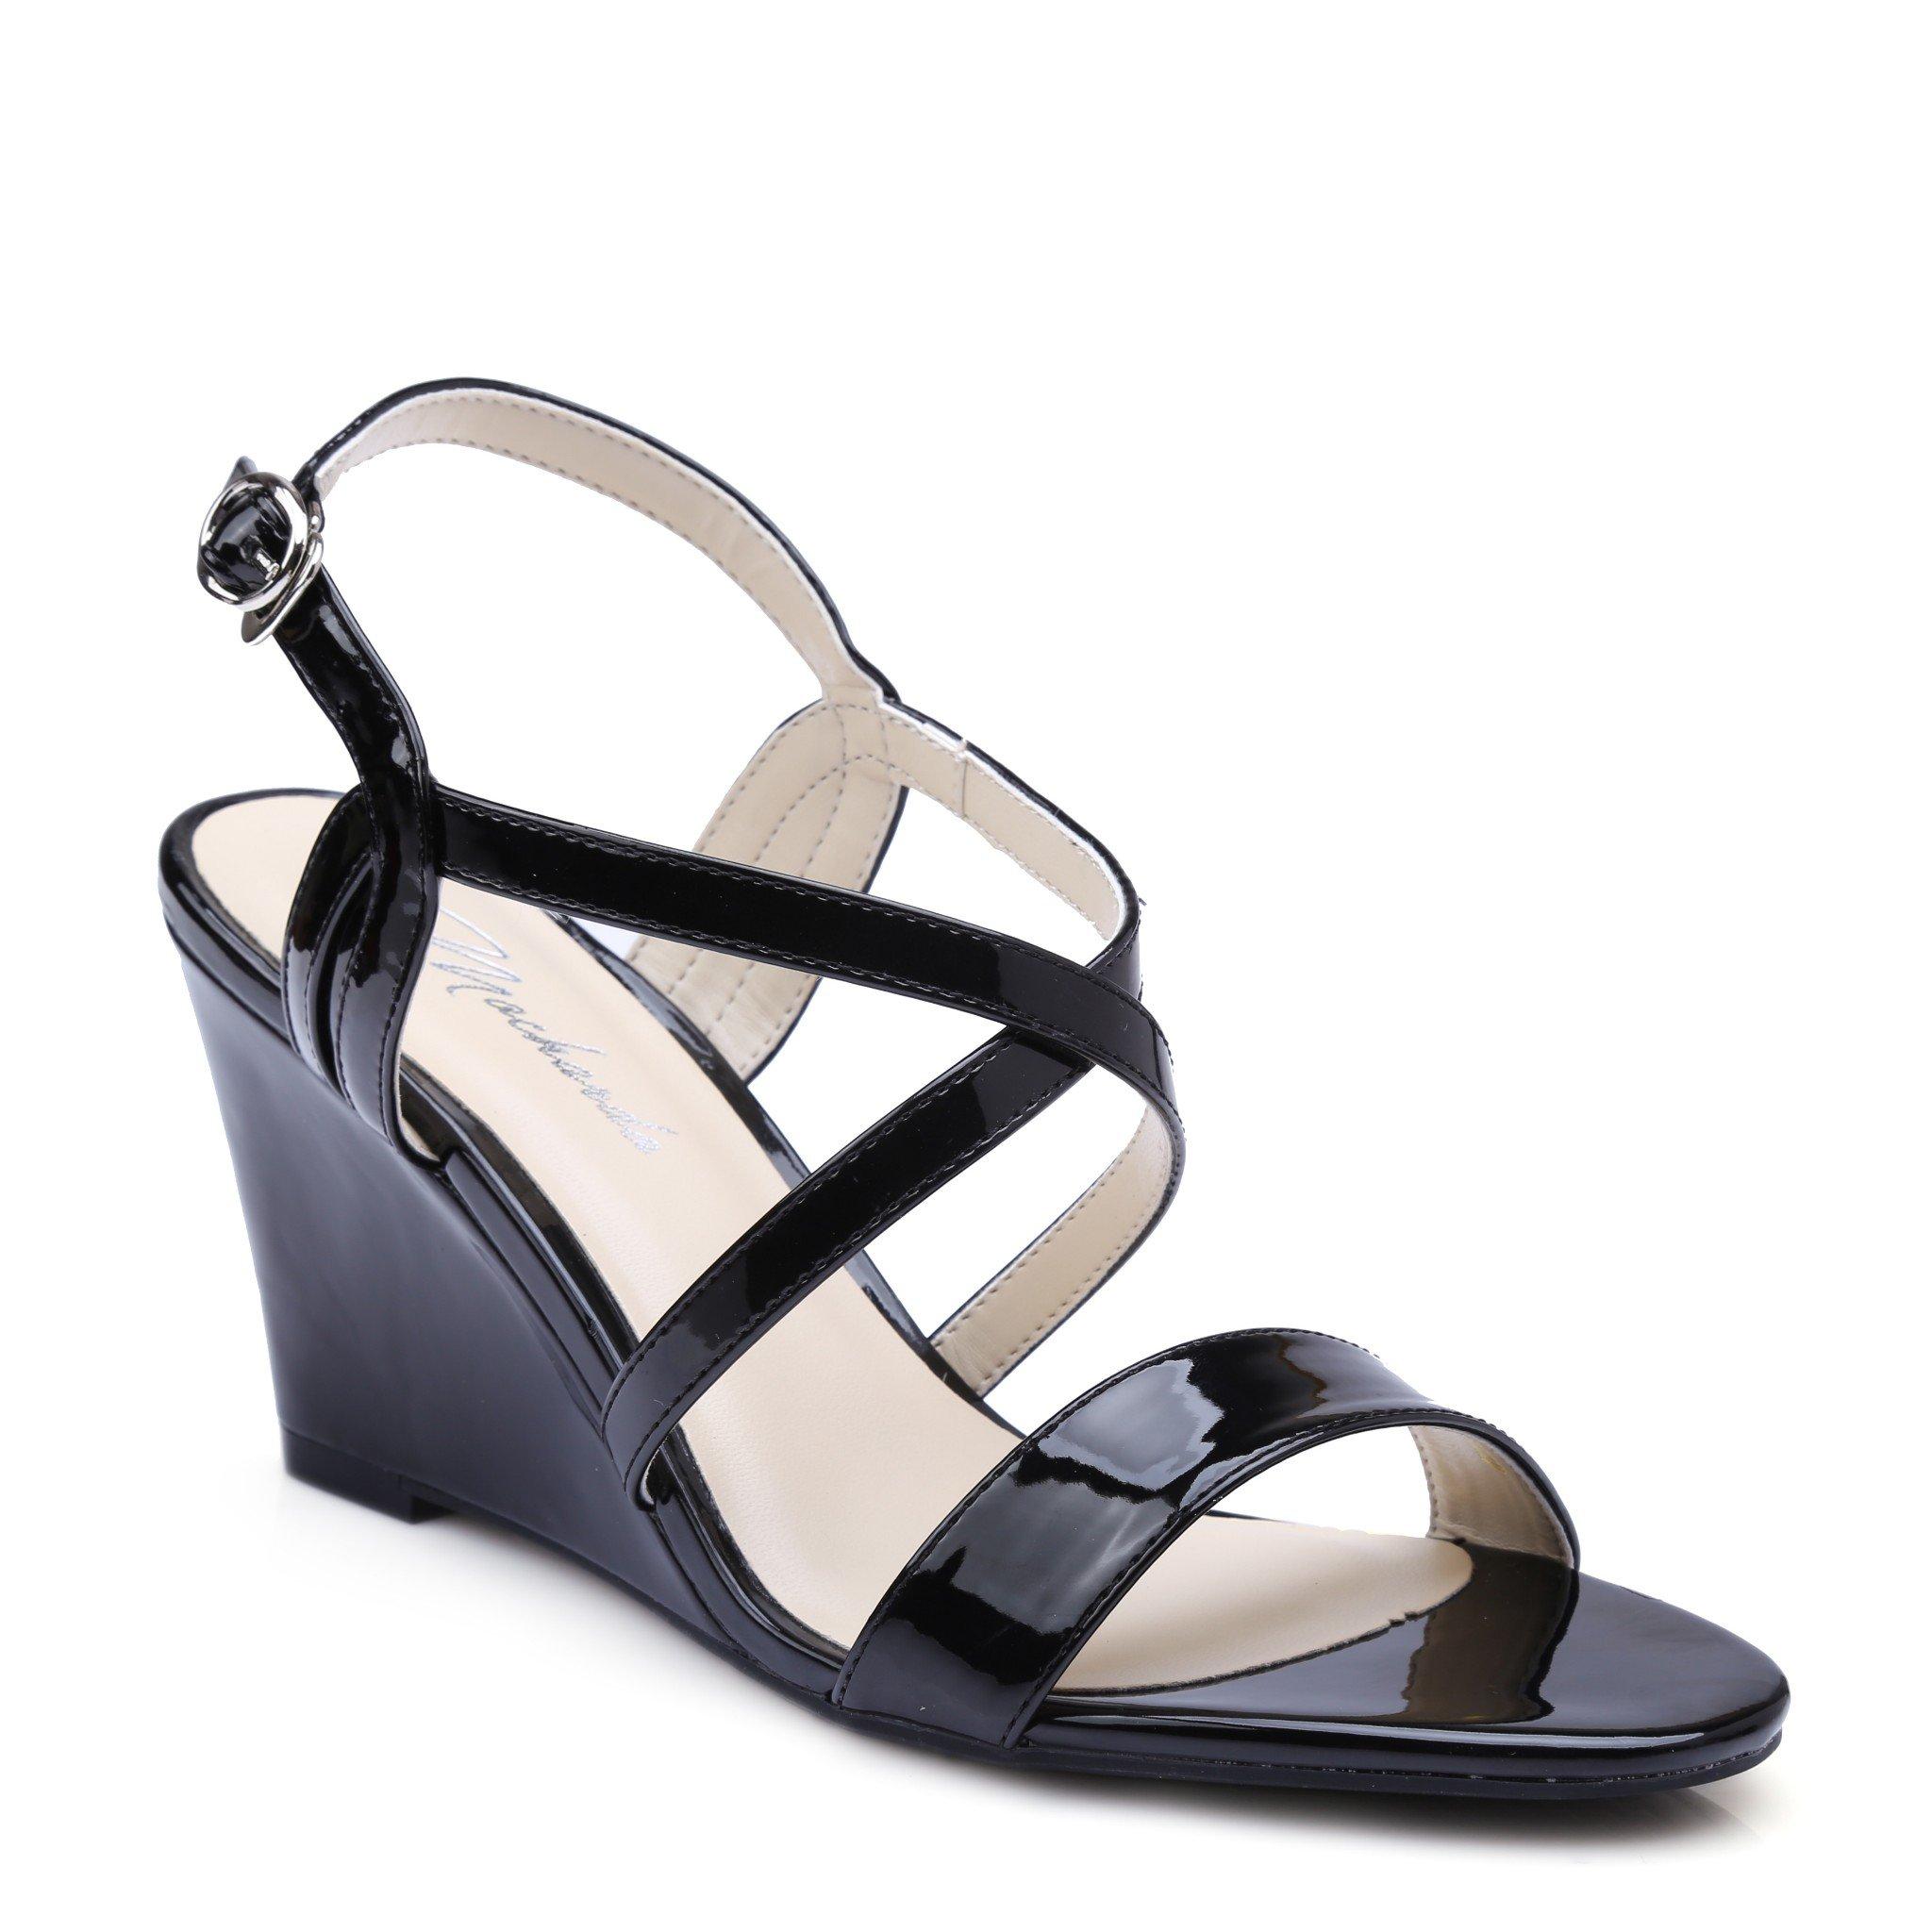 Sandal Xuong DP38 Den